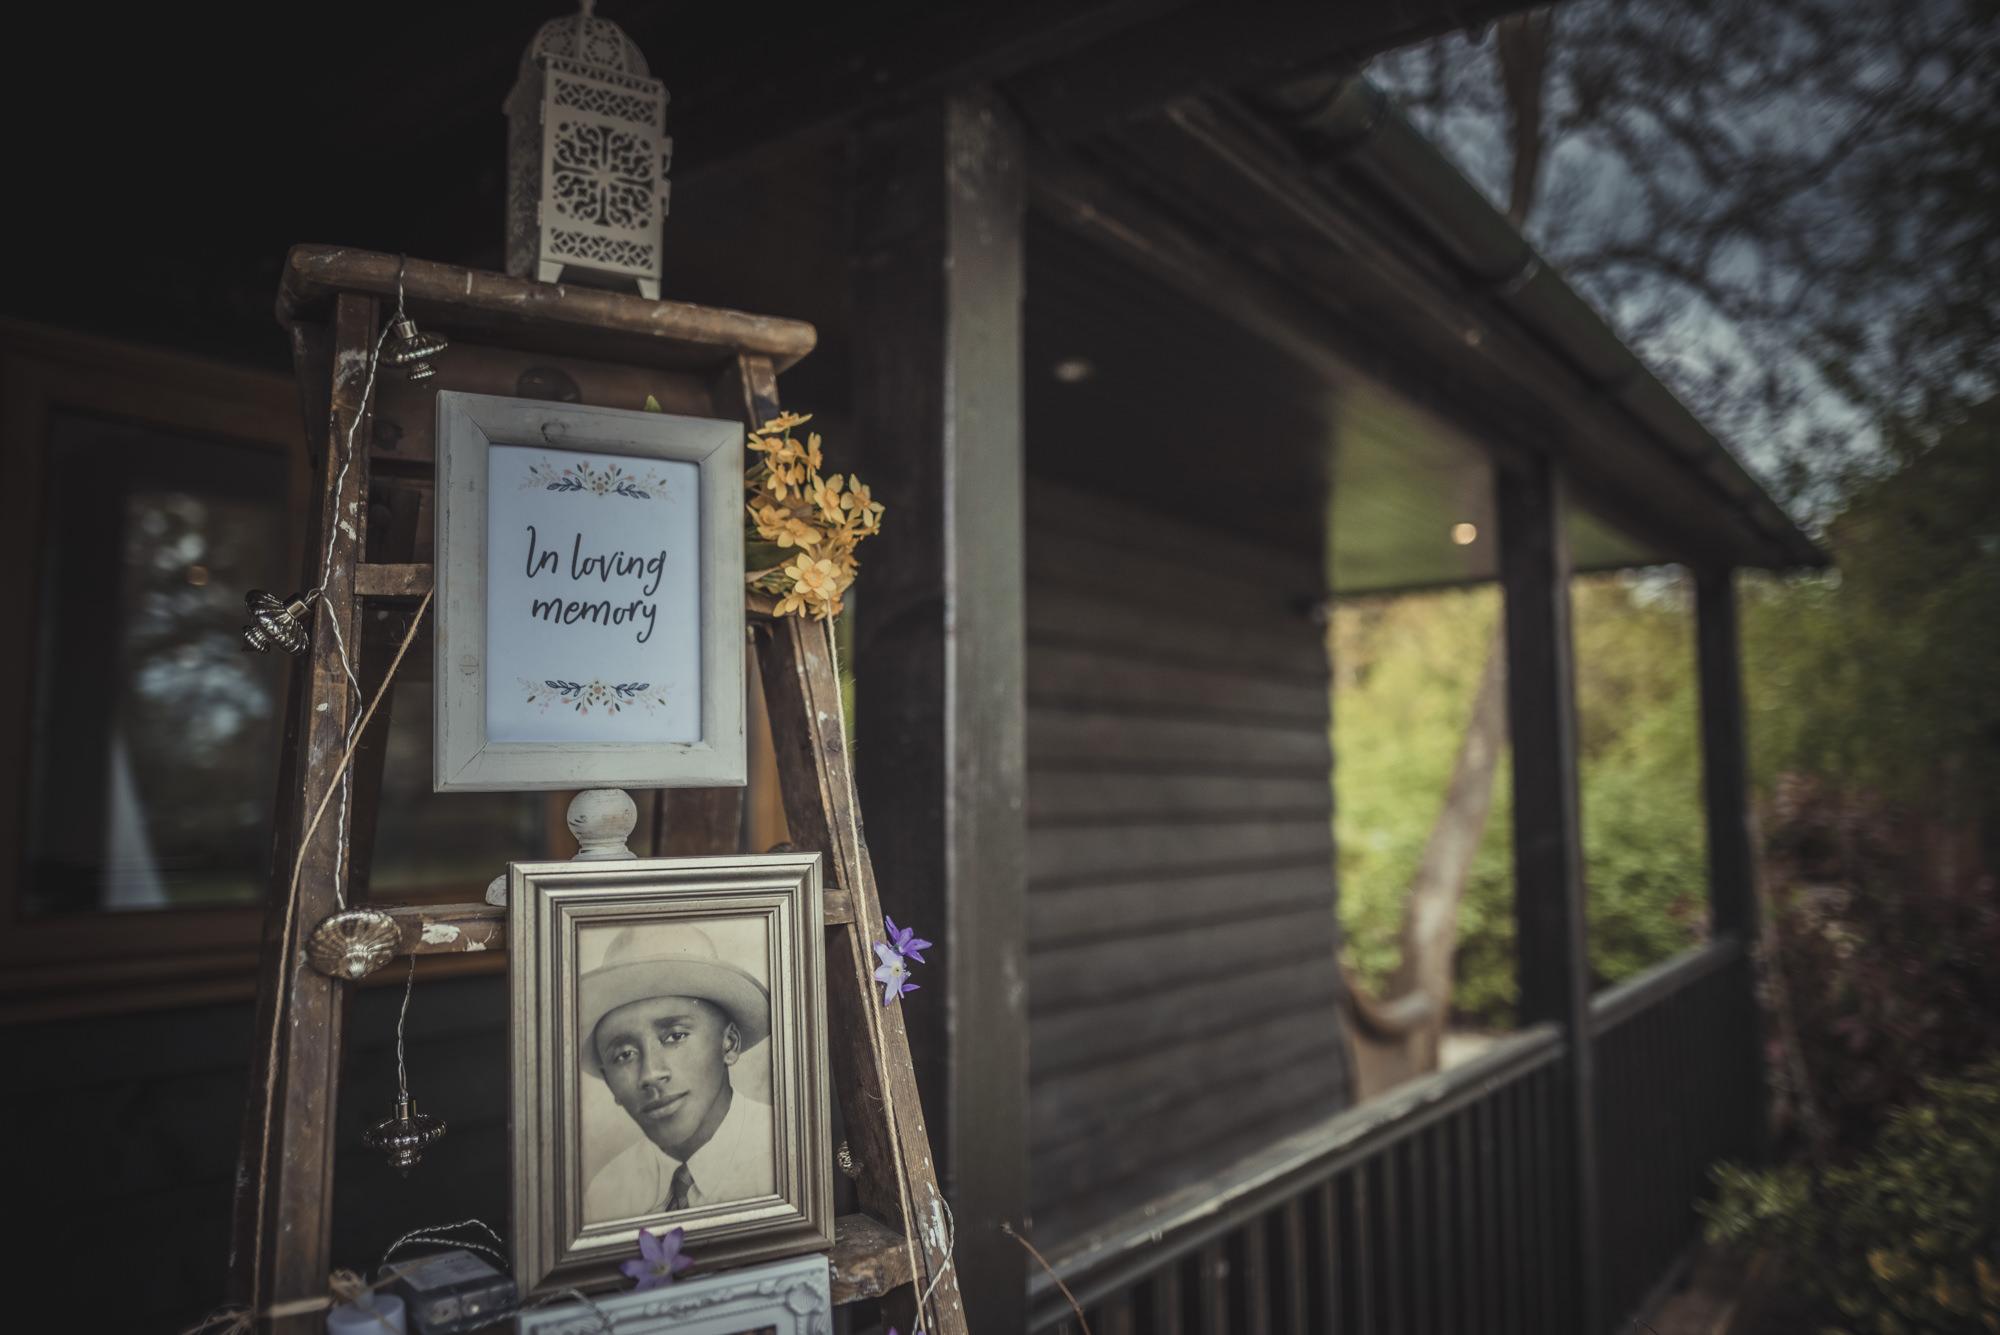 Jacqueline-Gareth-Wedding-Westmead-Events-Surrey-Manu-Mendoza-Wedding-Photography-156.jpg